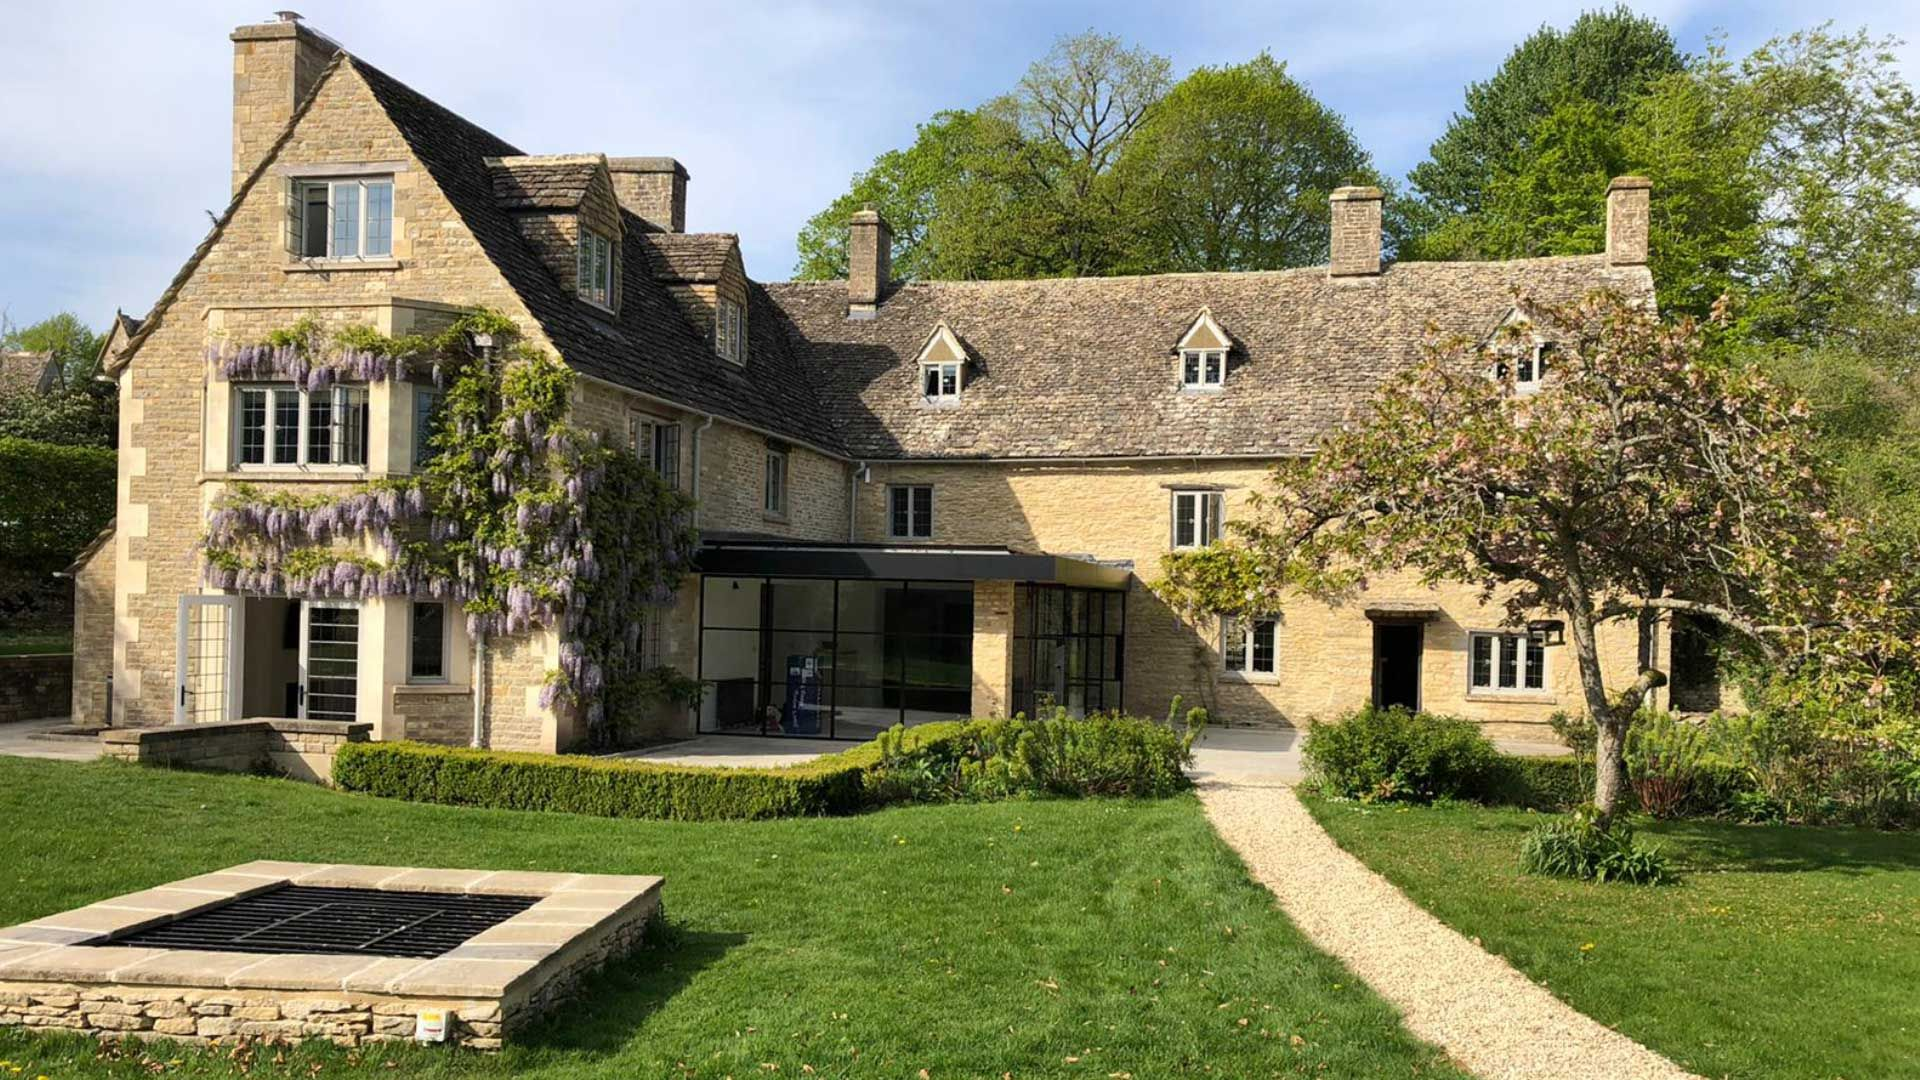 Swinbrook Cottage - StayCotswold